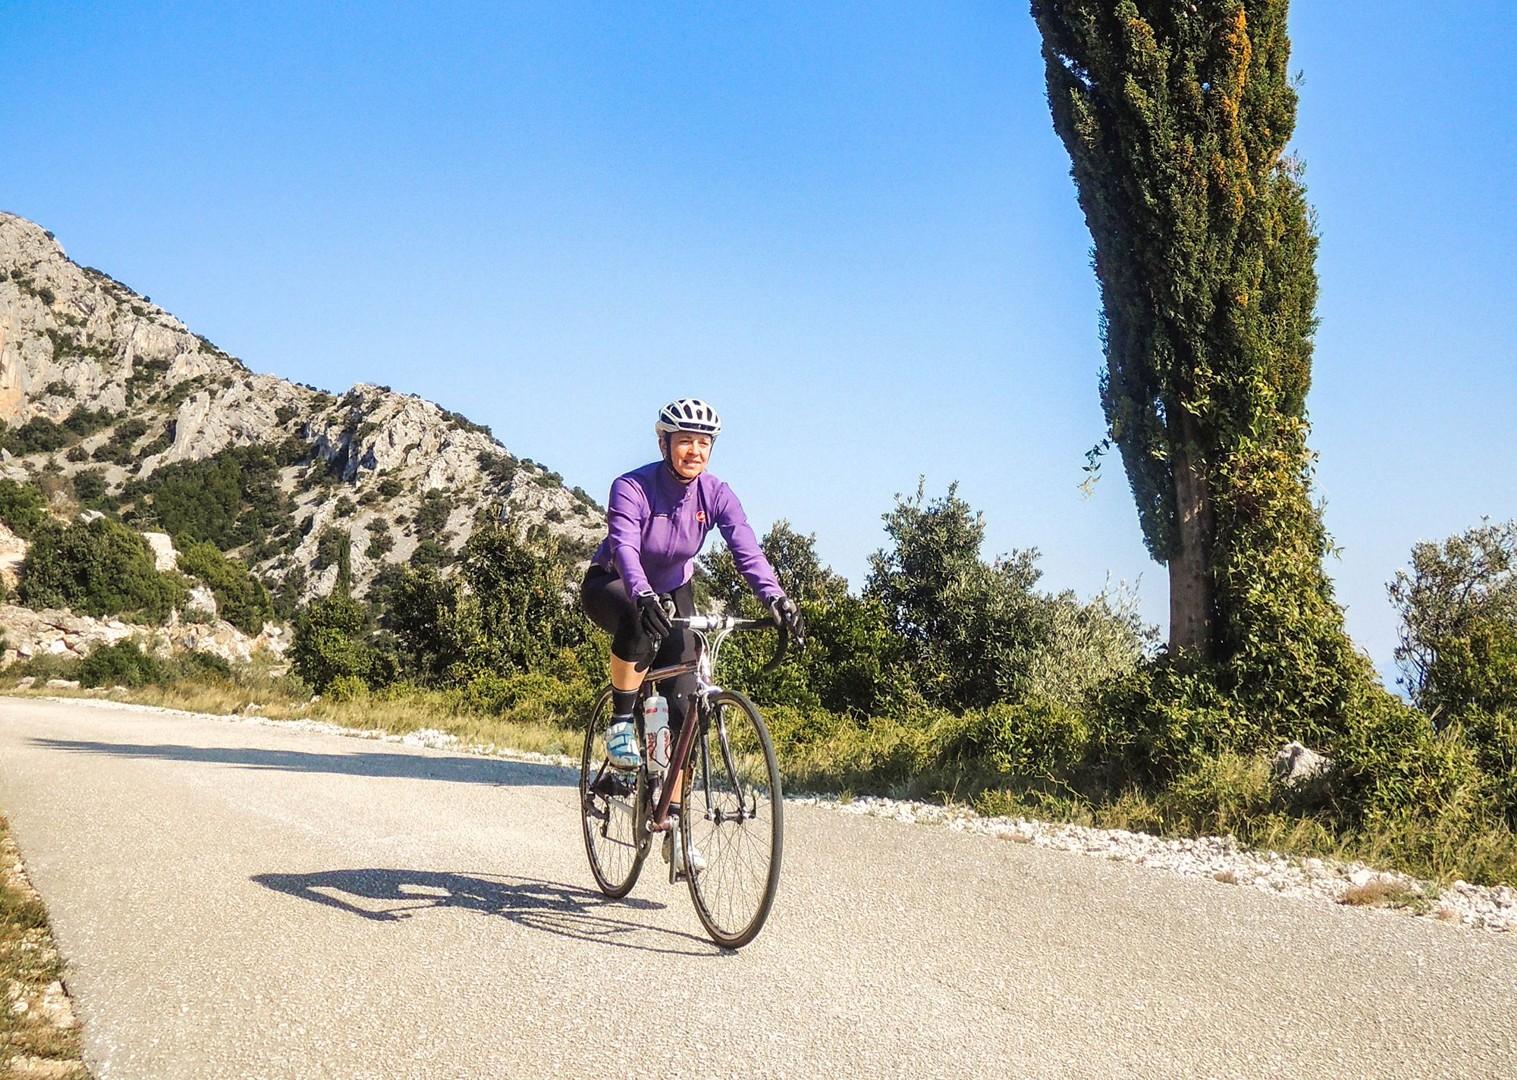 slovenia-and-croatia-guided-road-cycling-holiday-skedaddle-trips.jpg - Slovenia & Croatia - Julian Alps & Istria - Guided Road Cycling Holiday - Road Cycling